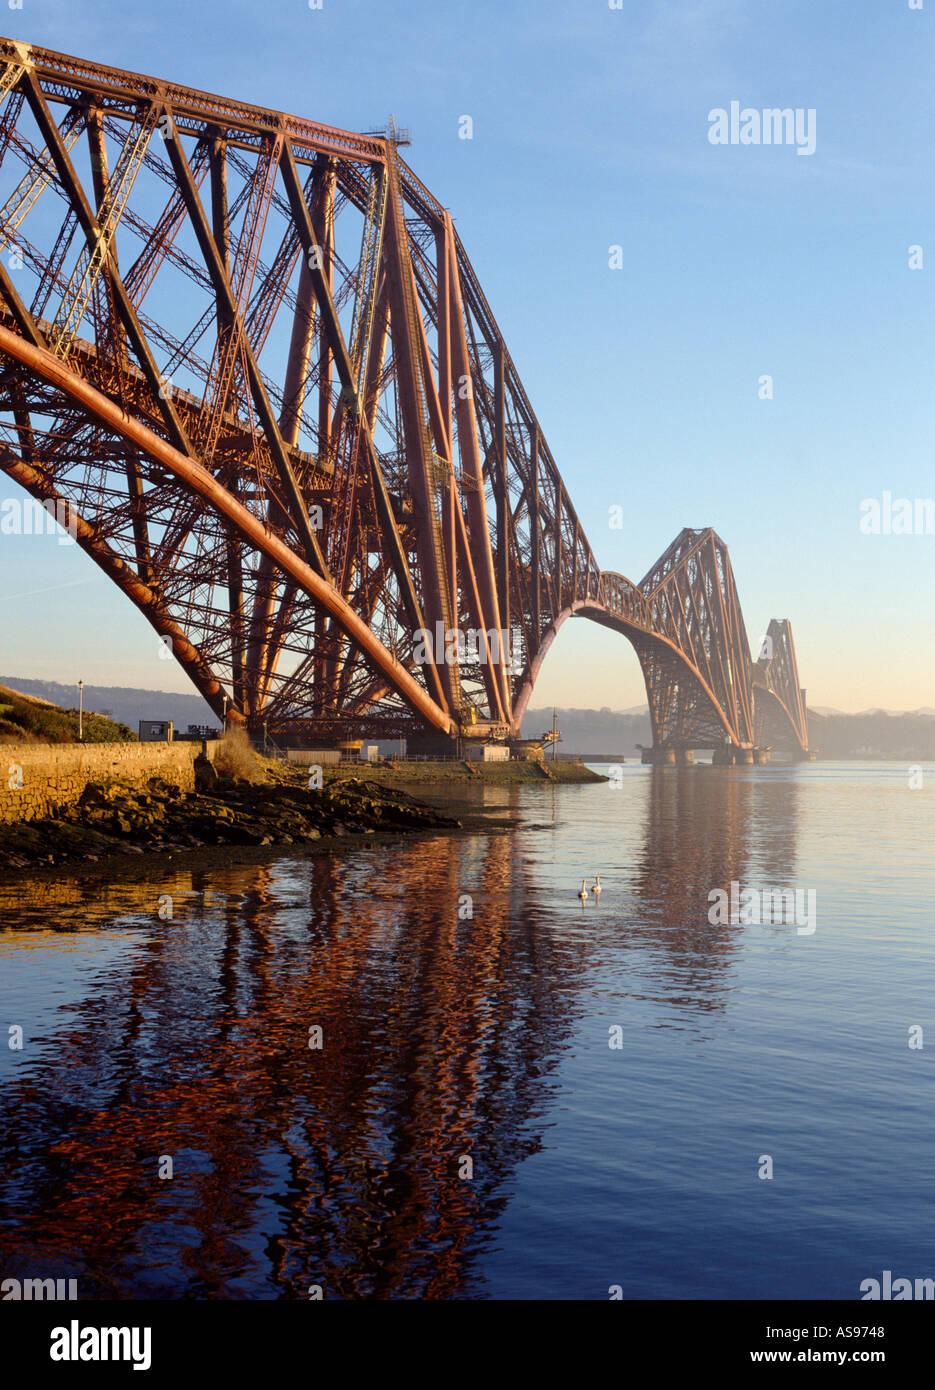 dh Forth Railway Bridge FORTH BRIDGE FORTH BRIDGE Victorian Cantilever Firth of Forth river scotland rail bridges Stock Photo